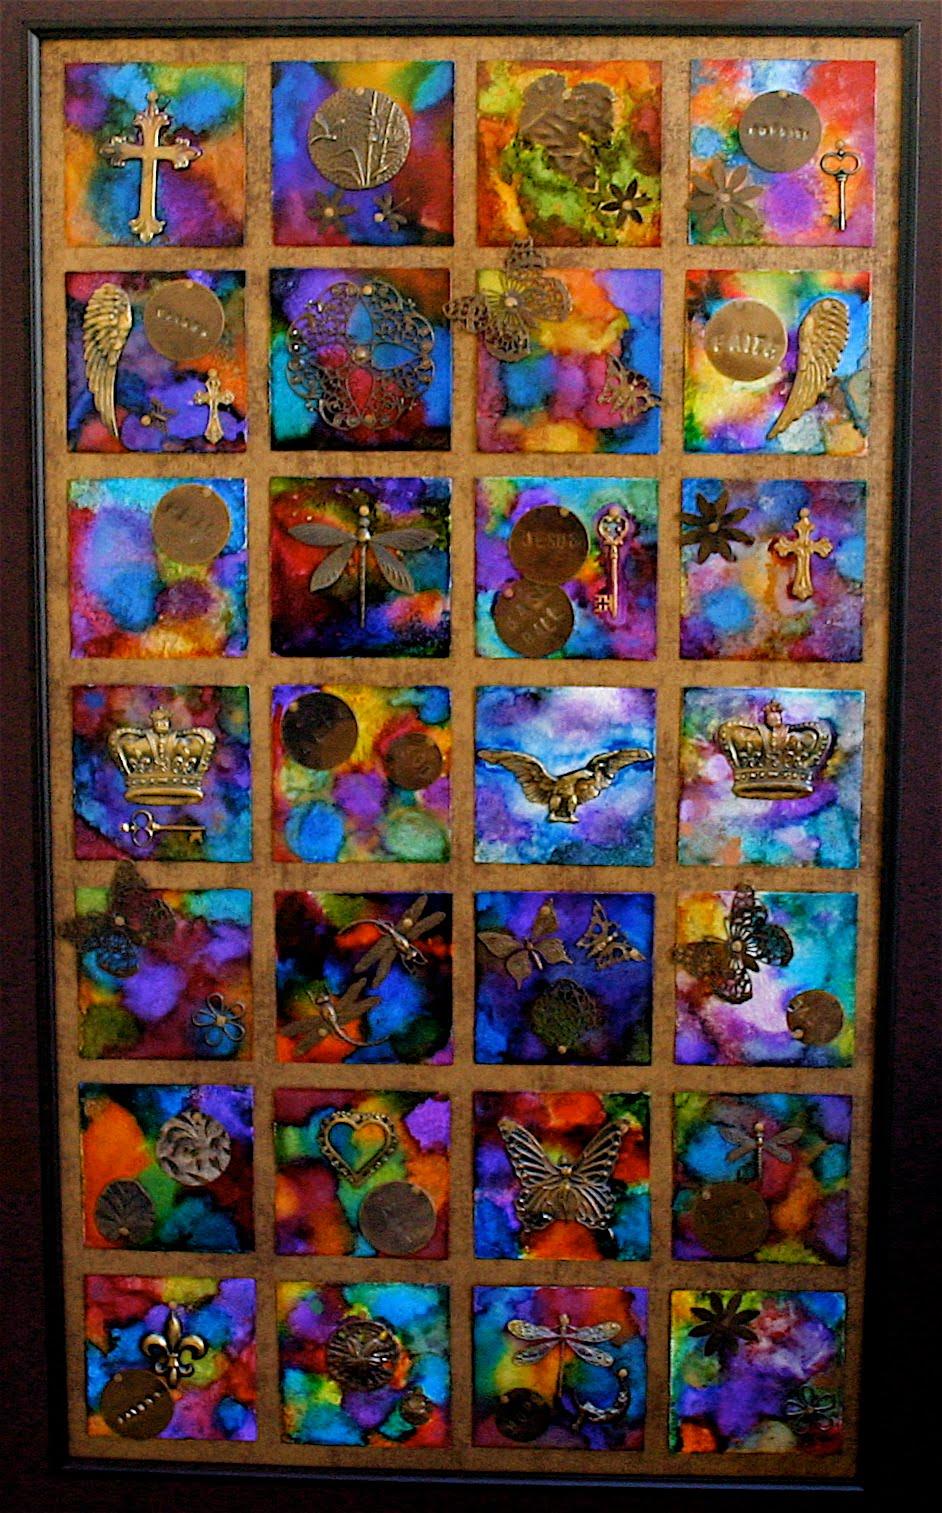 Vintaj Spring Auction Project - Finished